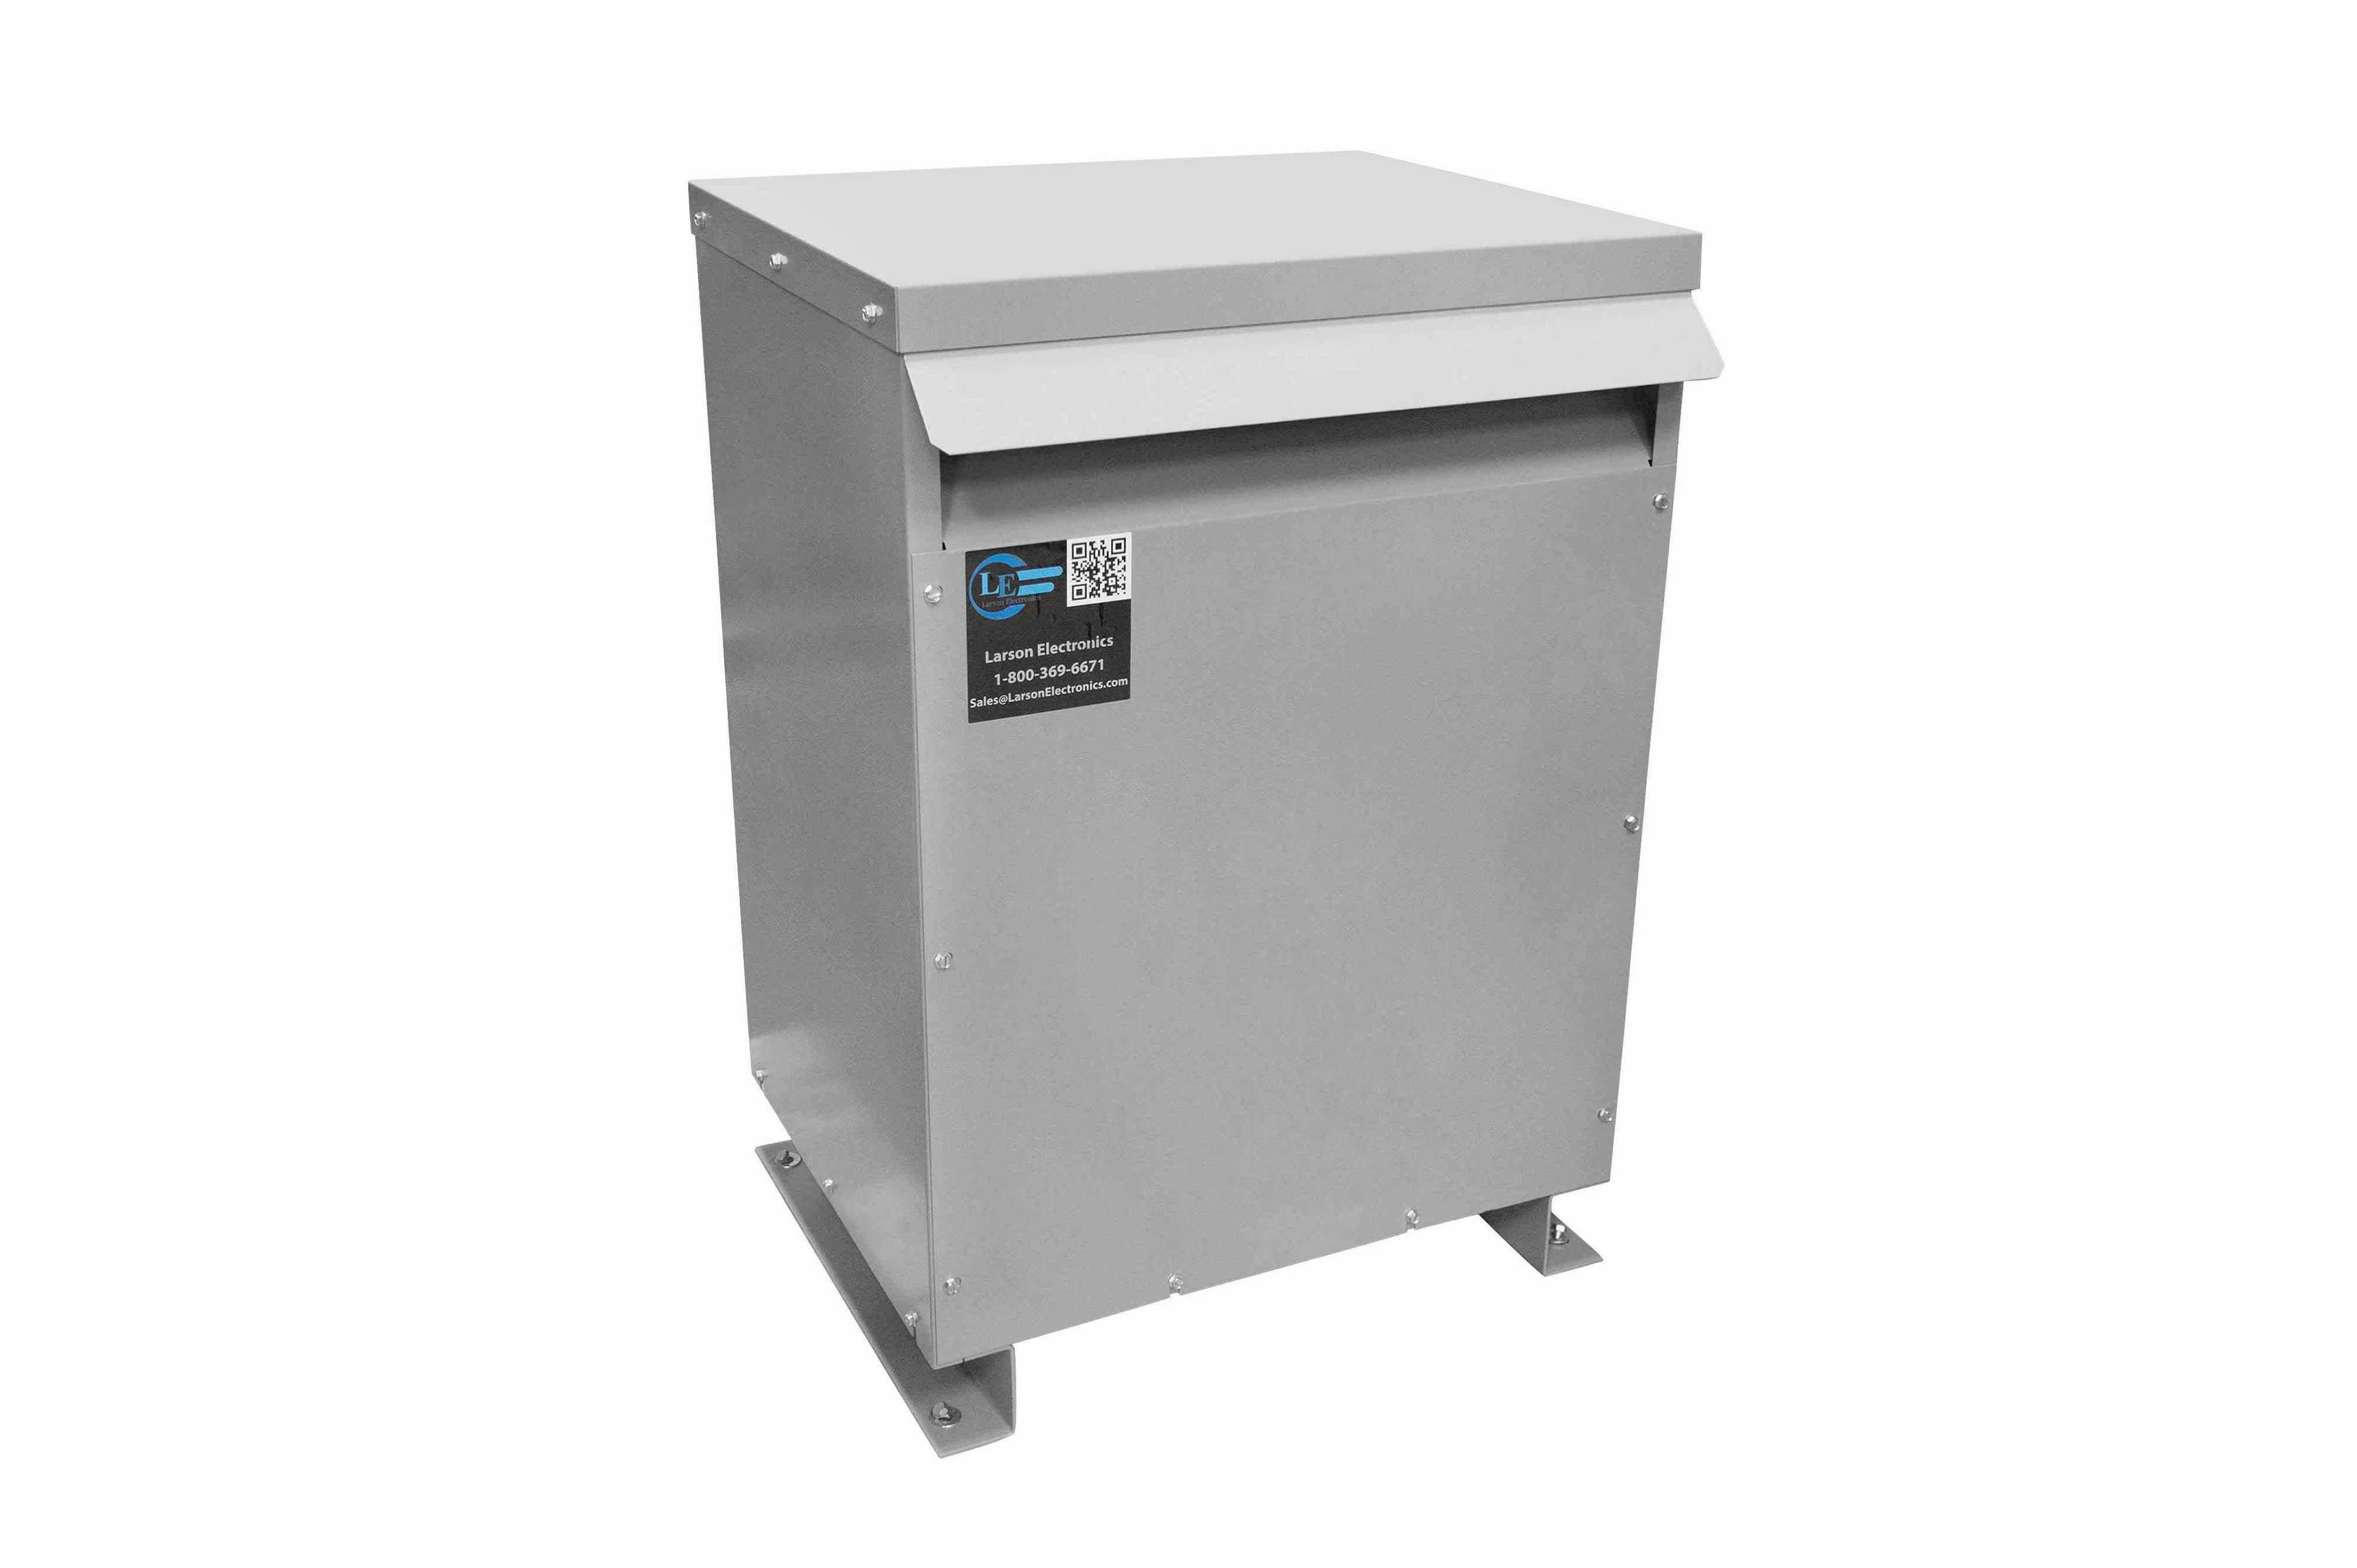 9 kVA 3PH Isolation Transformer, 208V Wye Primary, 600V Delta Secondary, N3R, Ventilated, 60 Hz